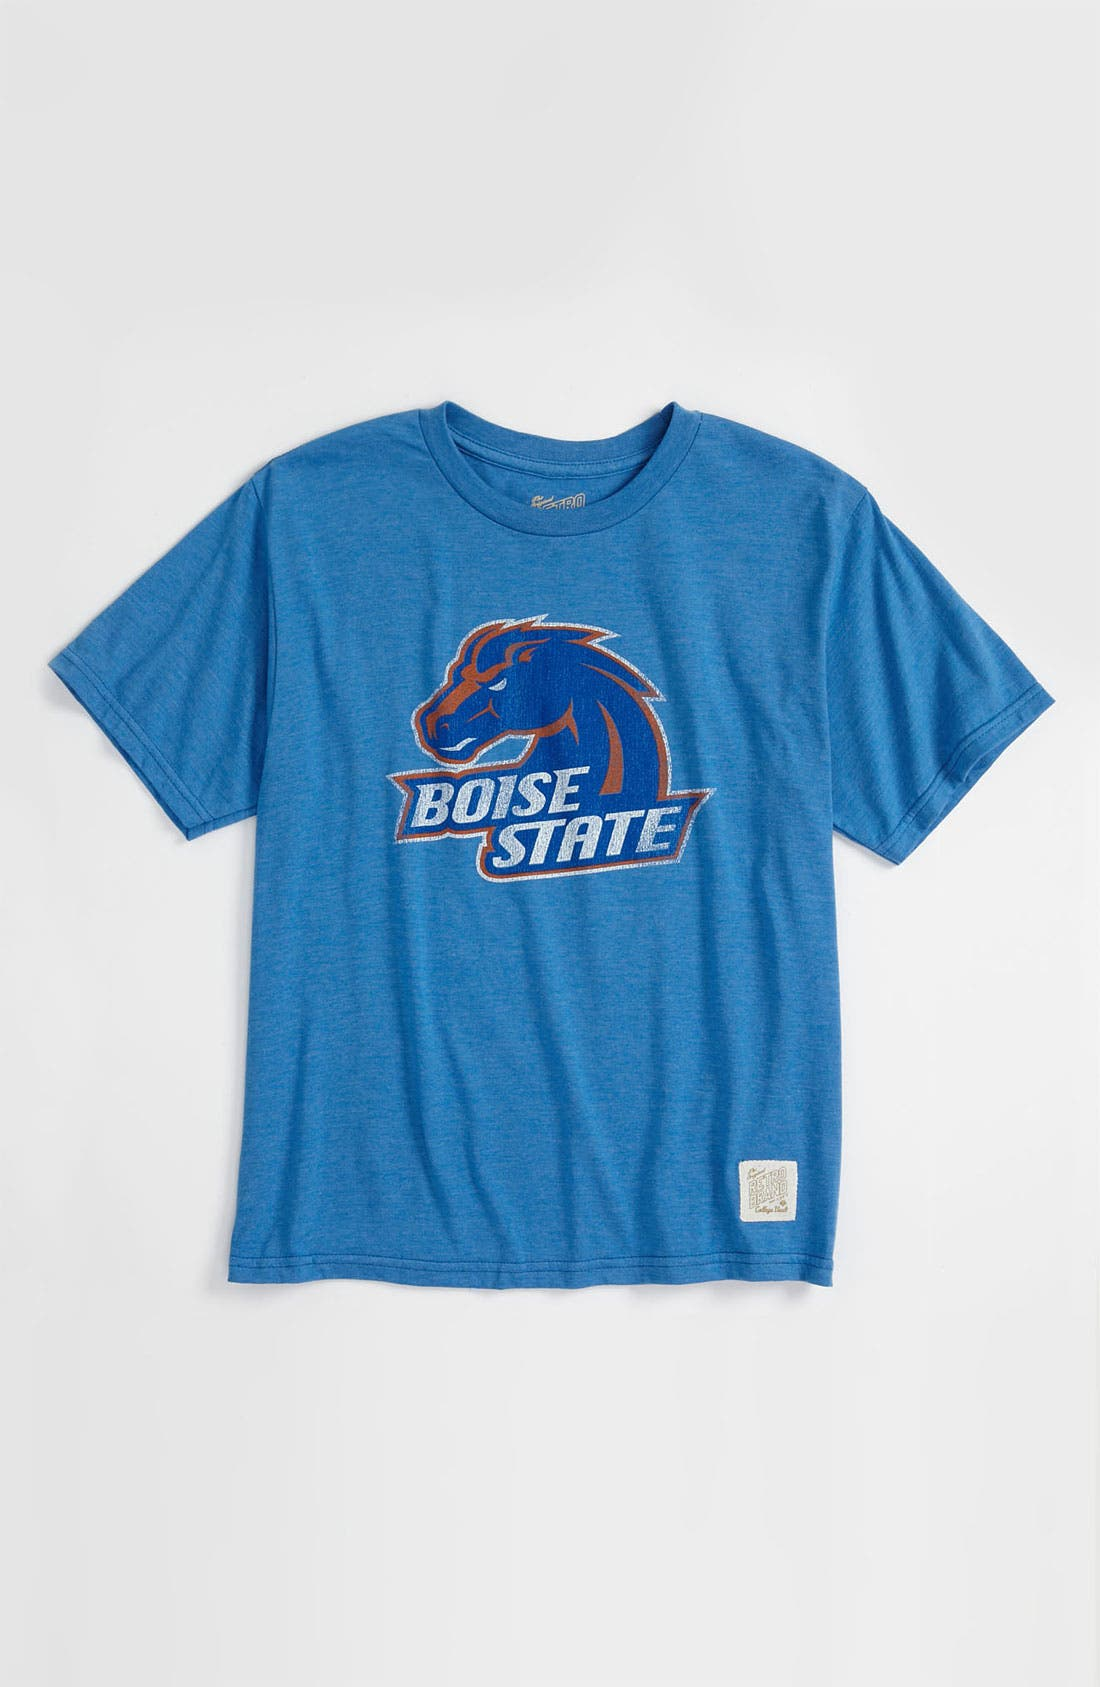 Alternate Image 1 Selected - The Original Retro Brand 'Boise State' T-Shirt (Big Boys)